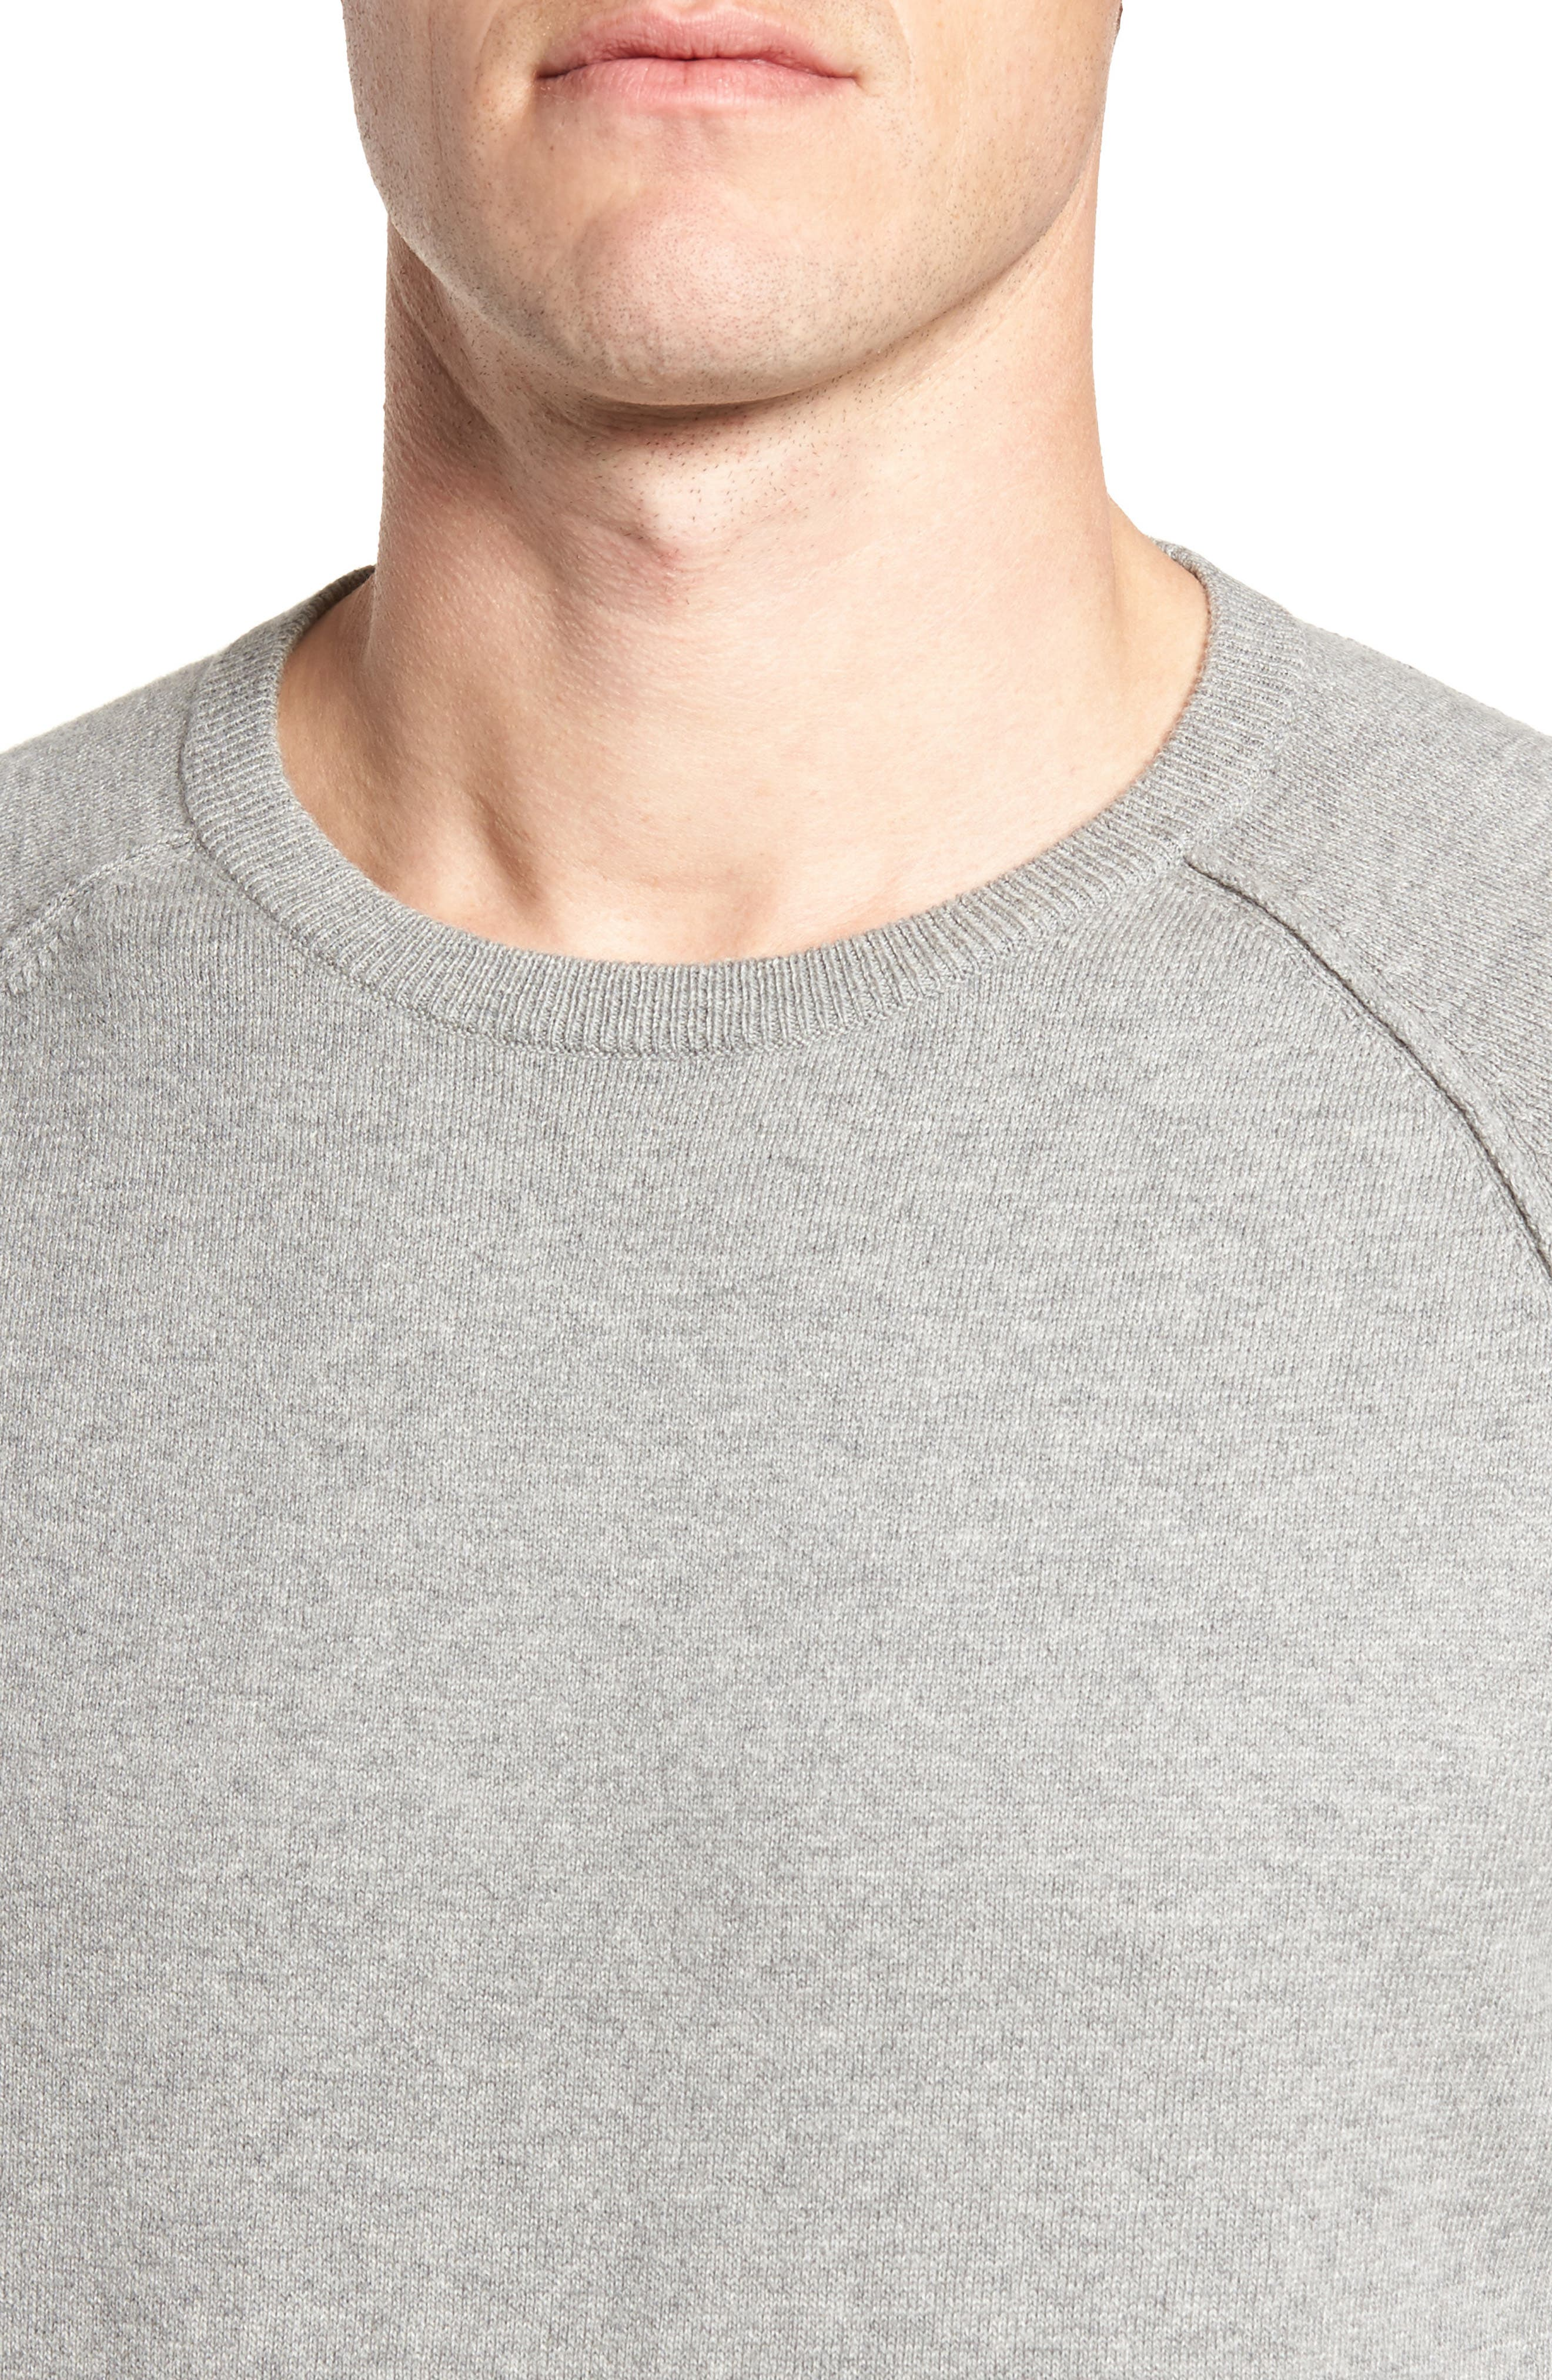 Saddle Shoulder Cotton & Cashmere Sweater,                             Alternate thumbnail 4, color,                             Grey Heather